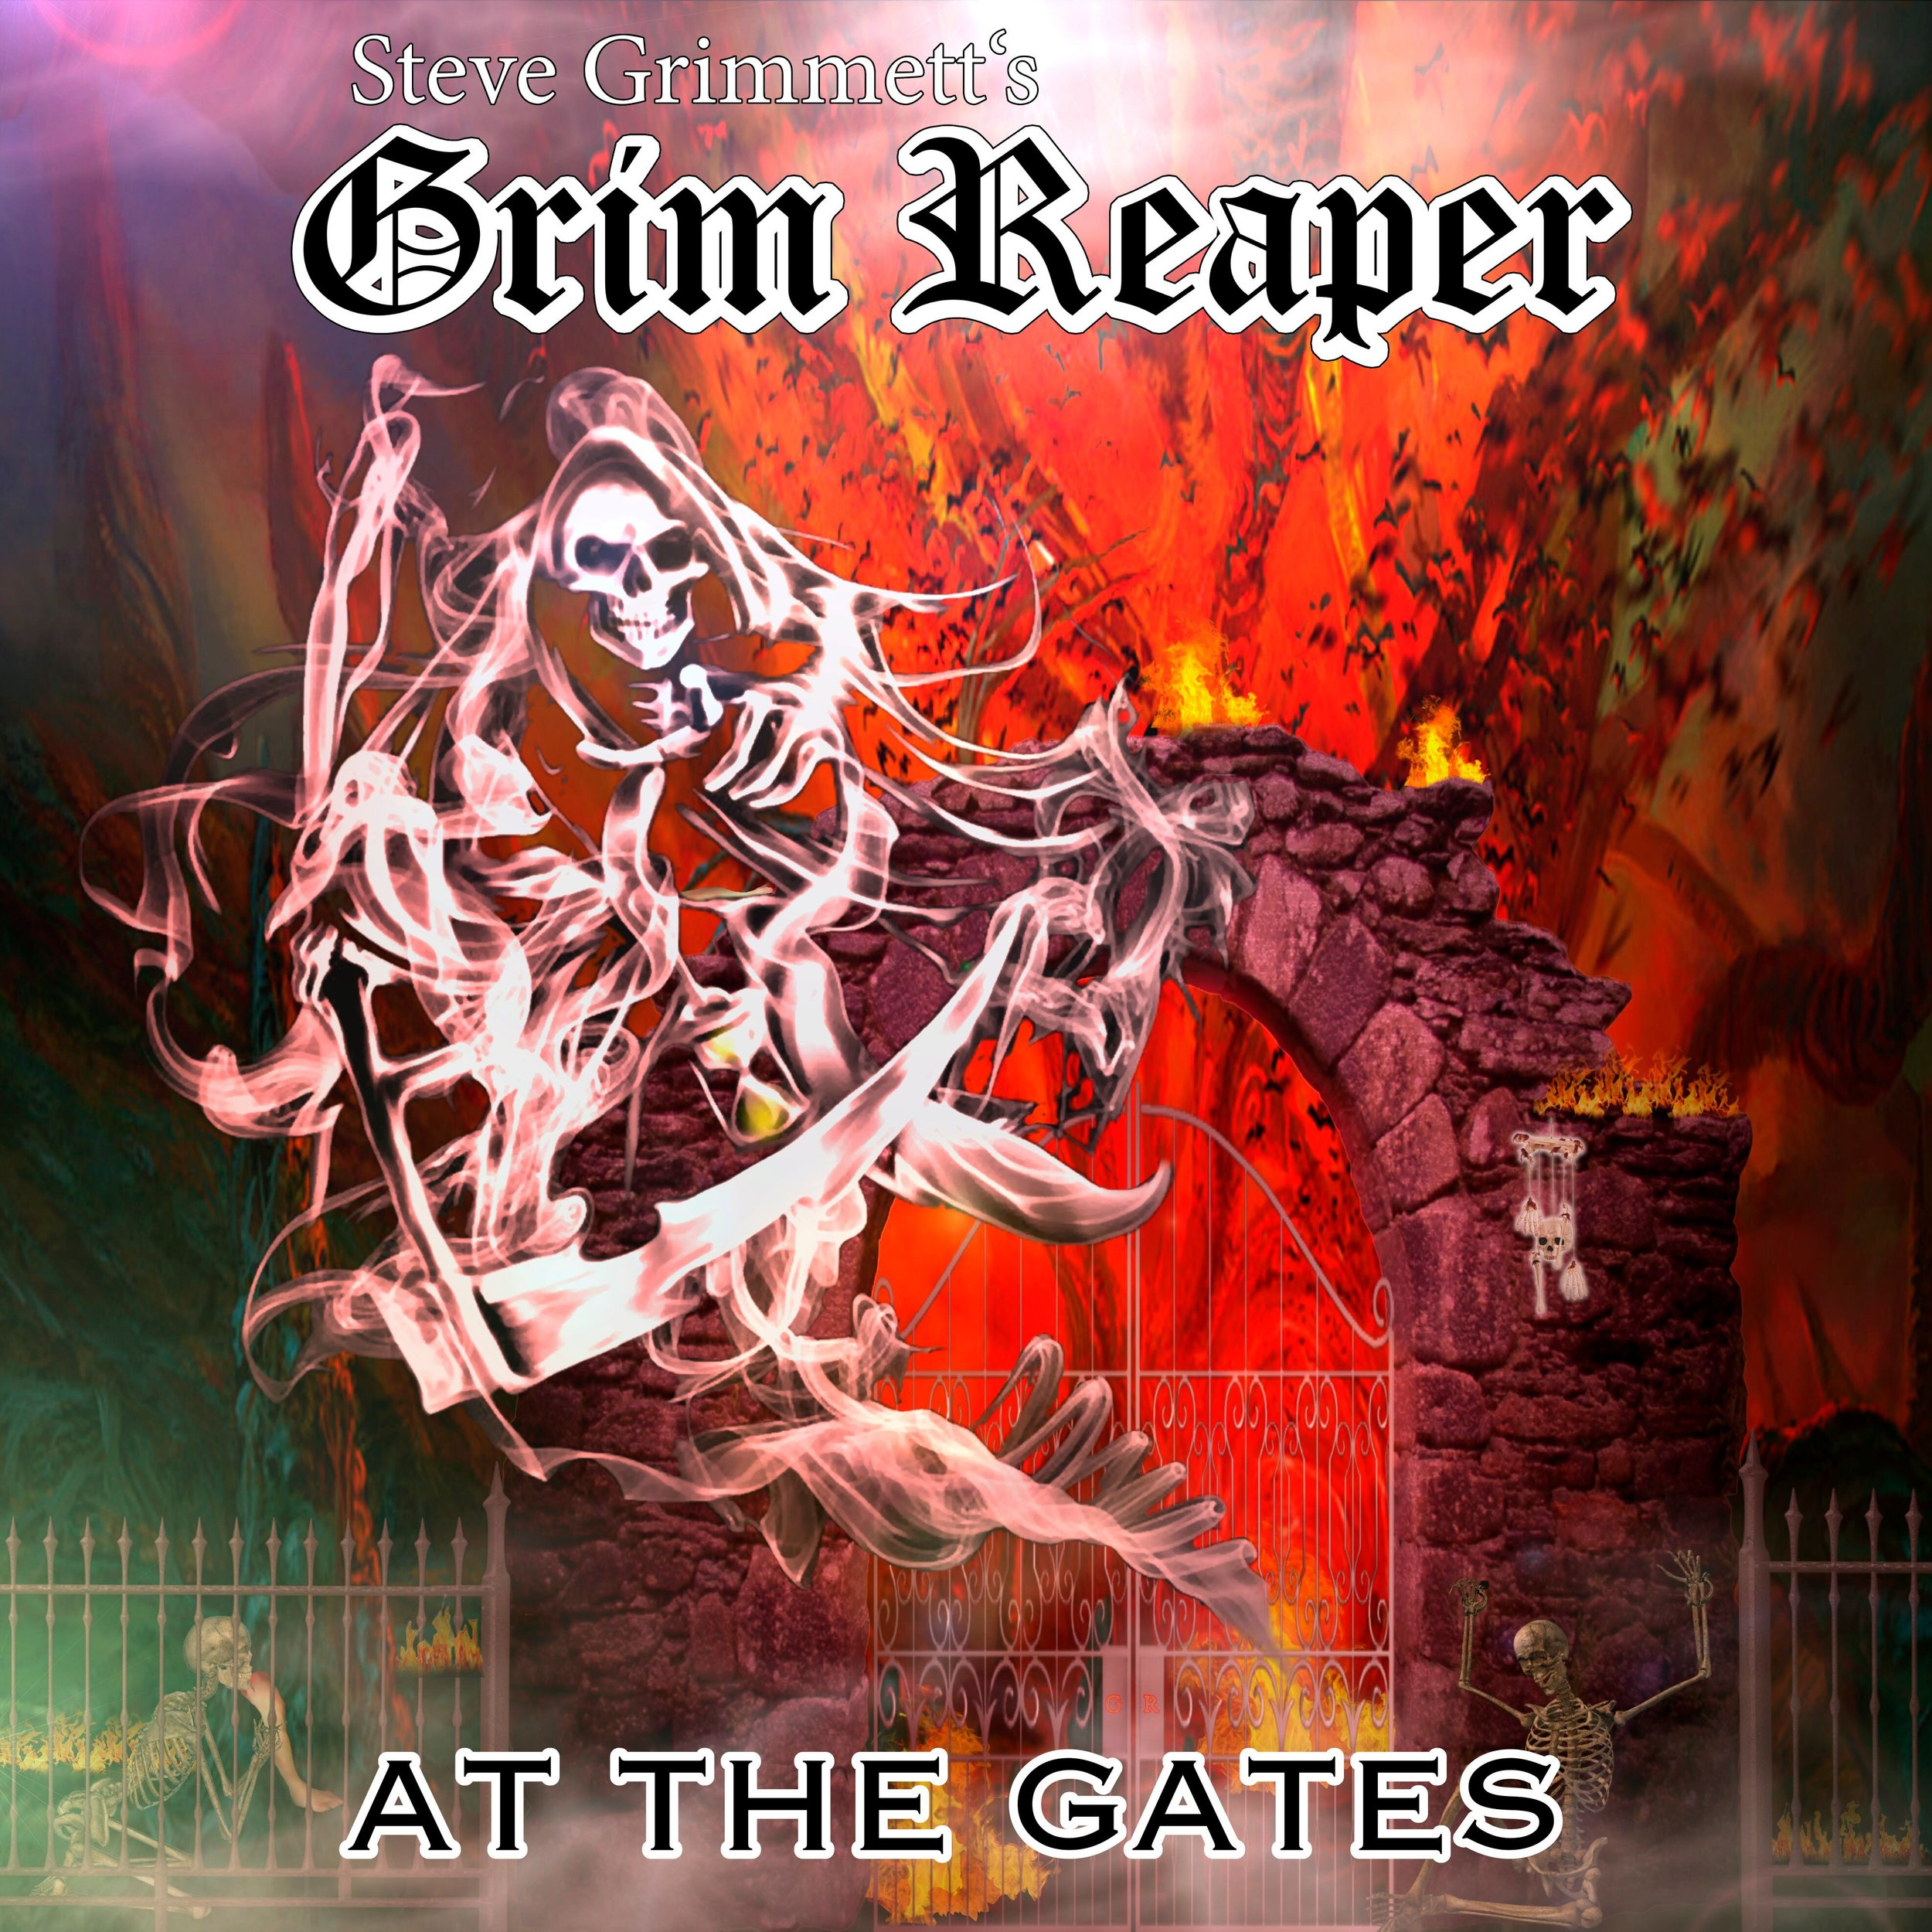 Grim Reaper's fifth album  At the Gates  will drop Oct. 11.